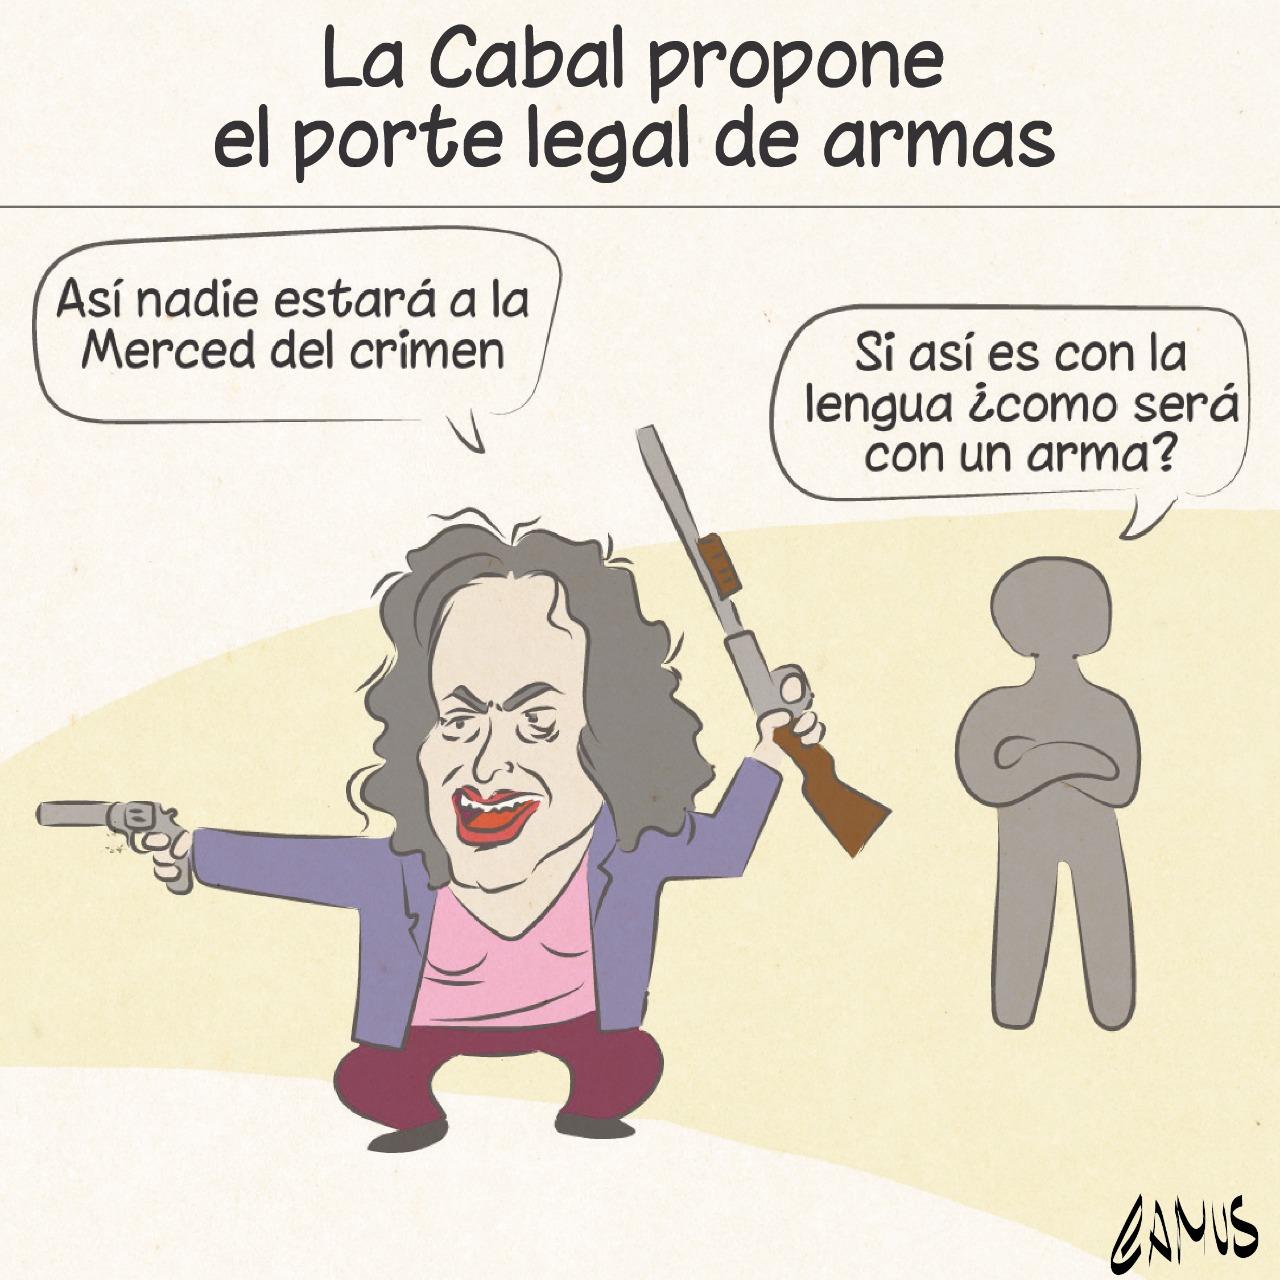 Cabal propone porte legal de armas 5